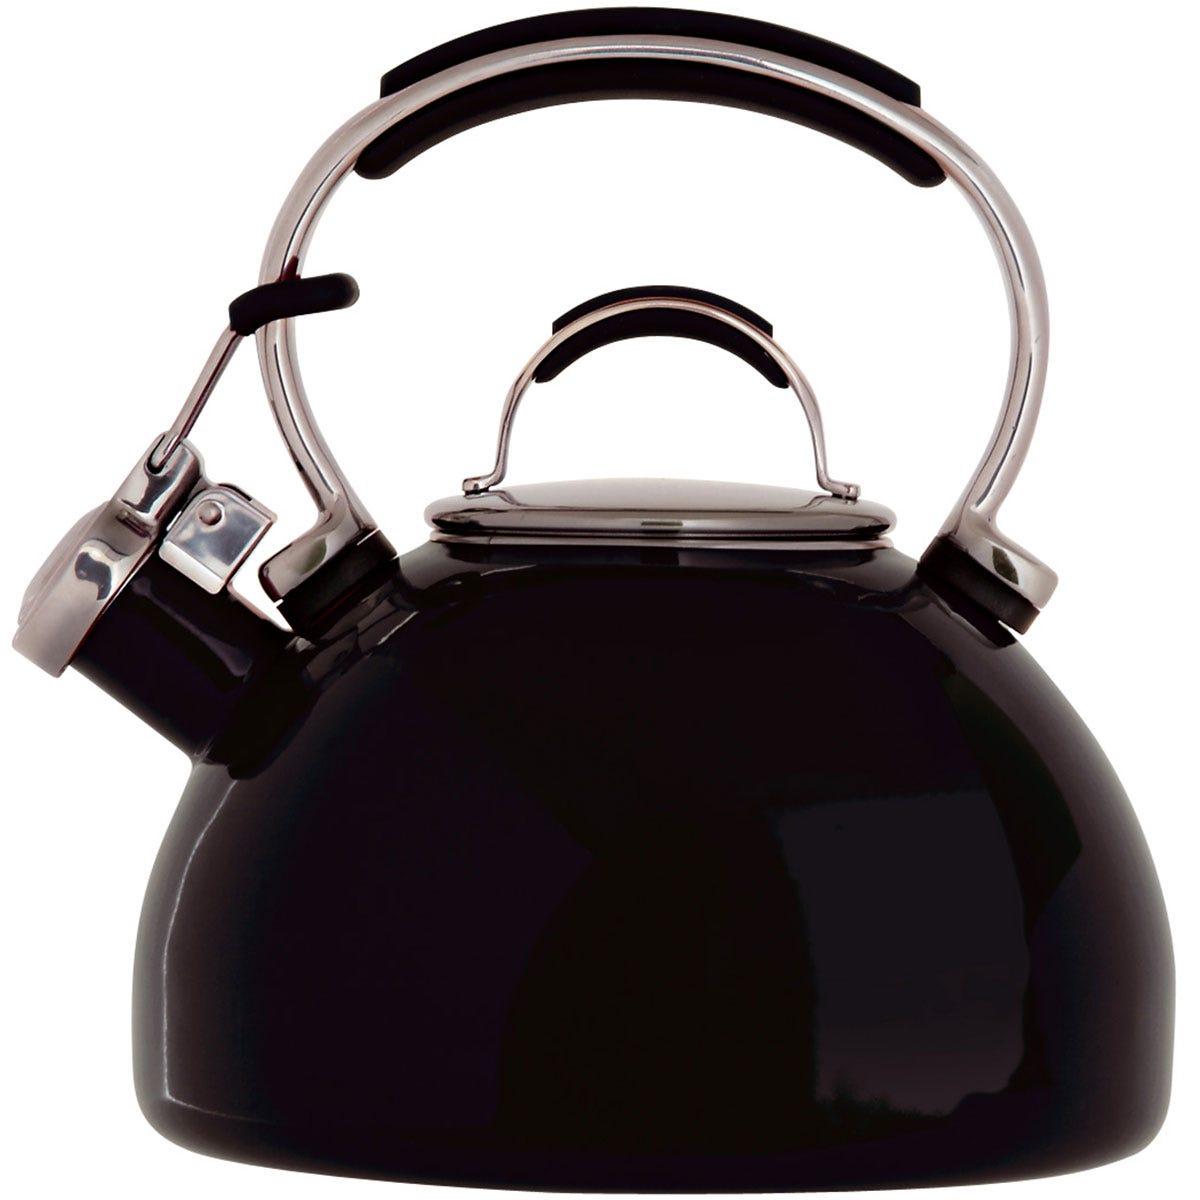 Prestige Black Stove Top Kettle - 2L